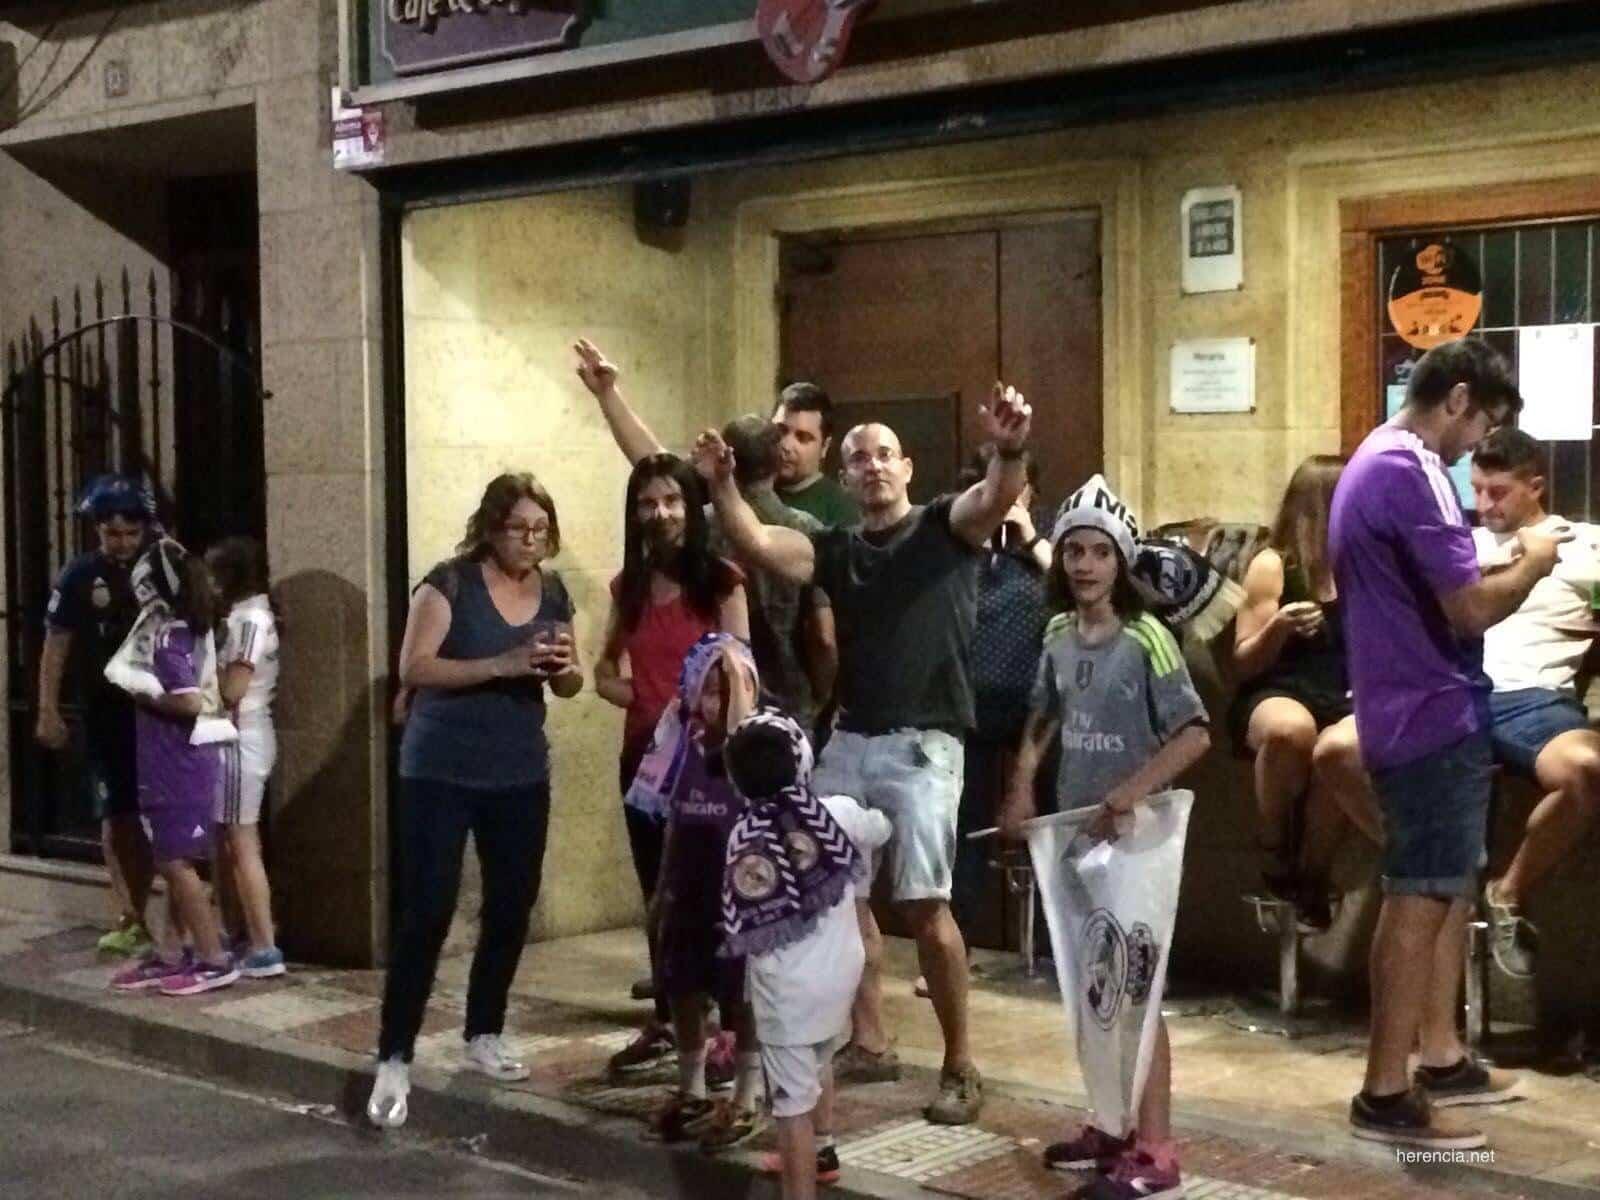 real madrid duodecima copa europa celebracion herencia 5 - Herencia celebra la Duodécima Copa de Europa que gana el Real Madrid